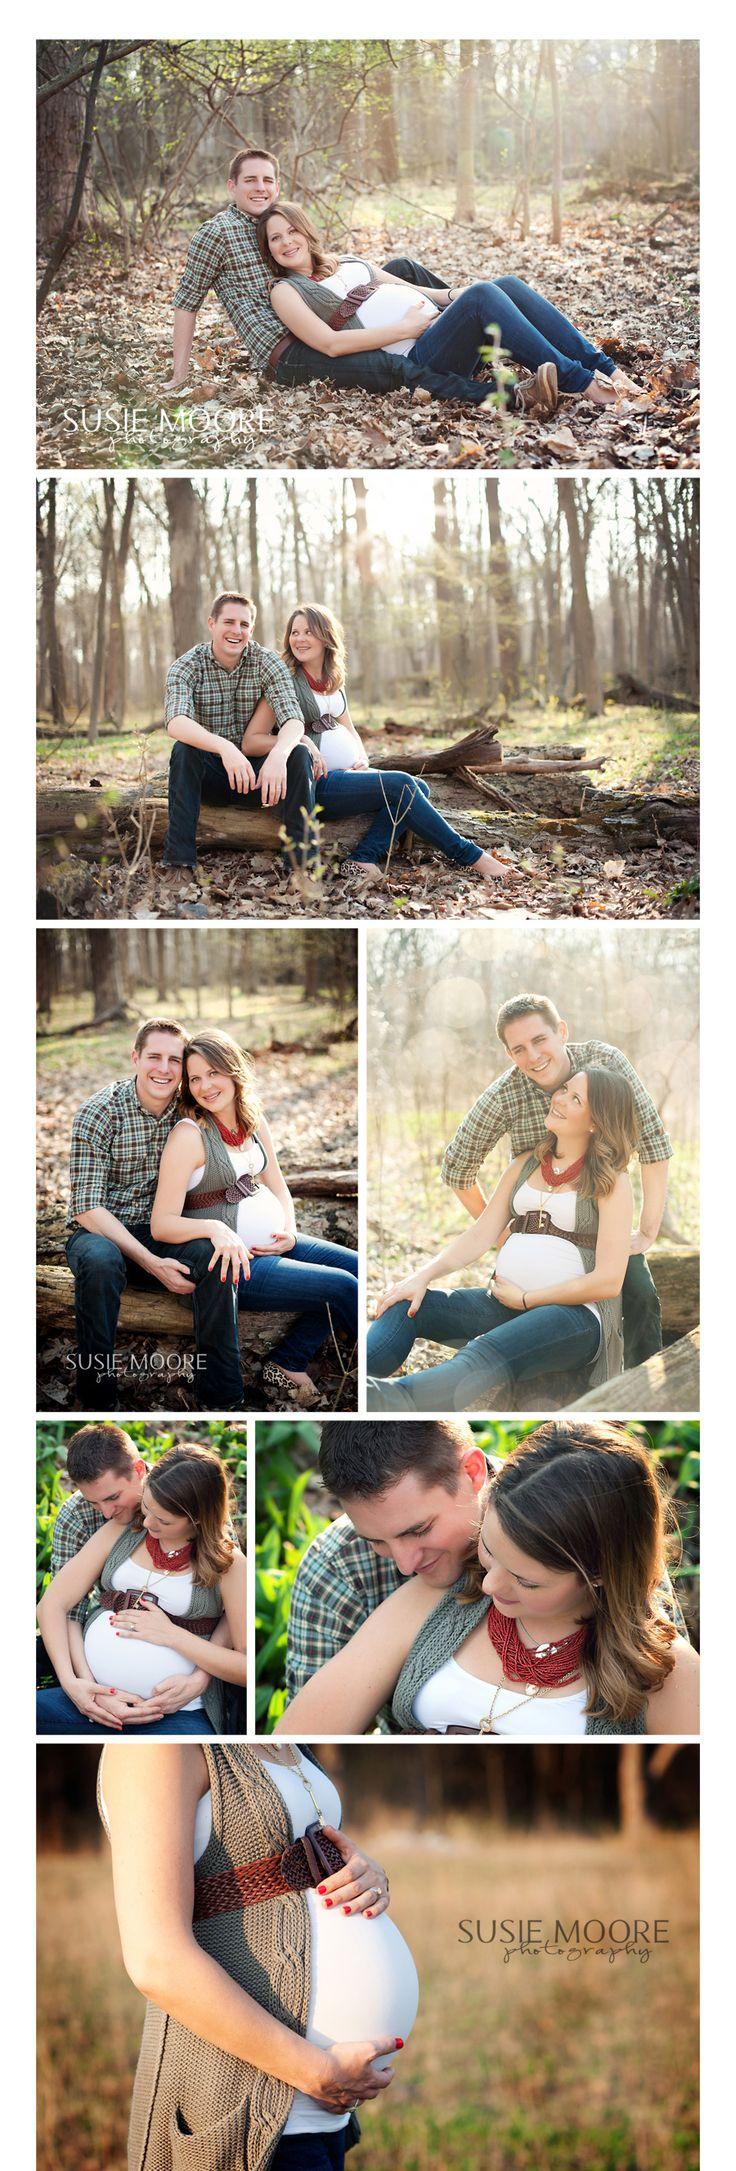 pareja, embarazo, prenatal, aire libre, fotografia, sesion